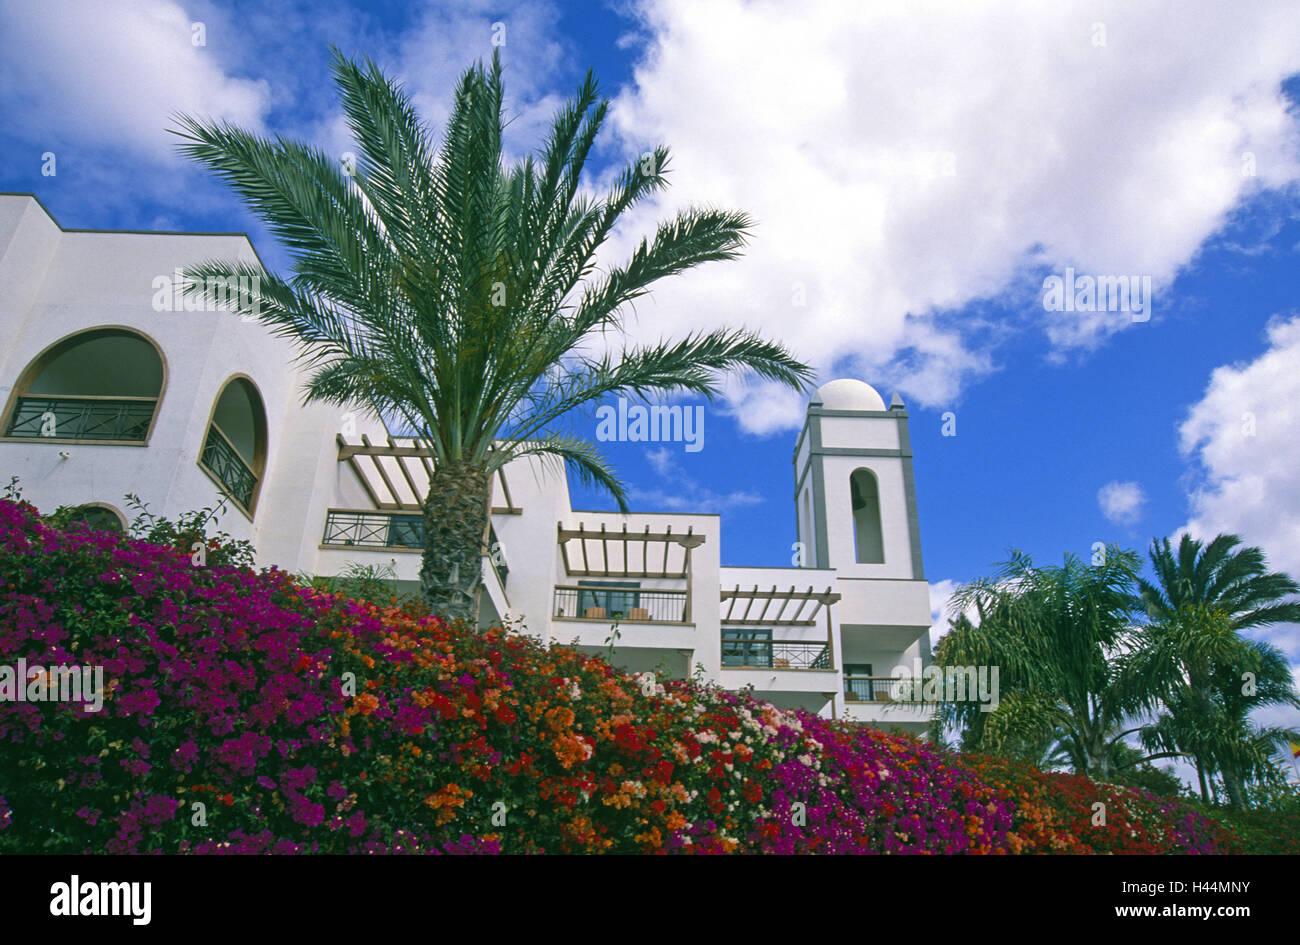 Spain, the Canaries, island Lanzarote, Playa Blanca, bougainvillaea, hotel, - Stock Image